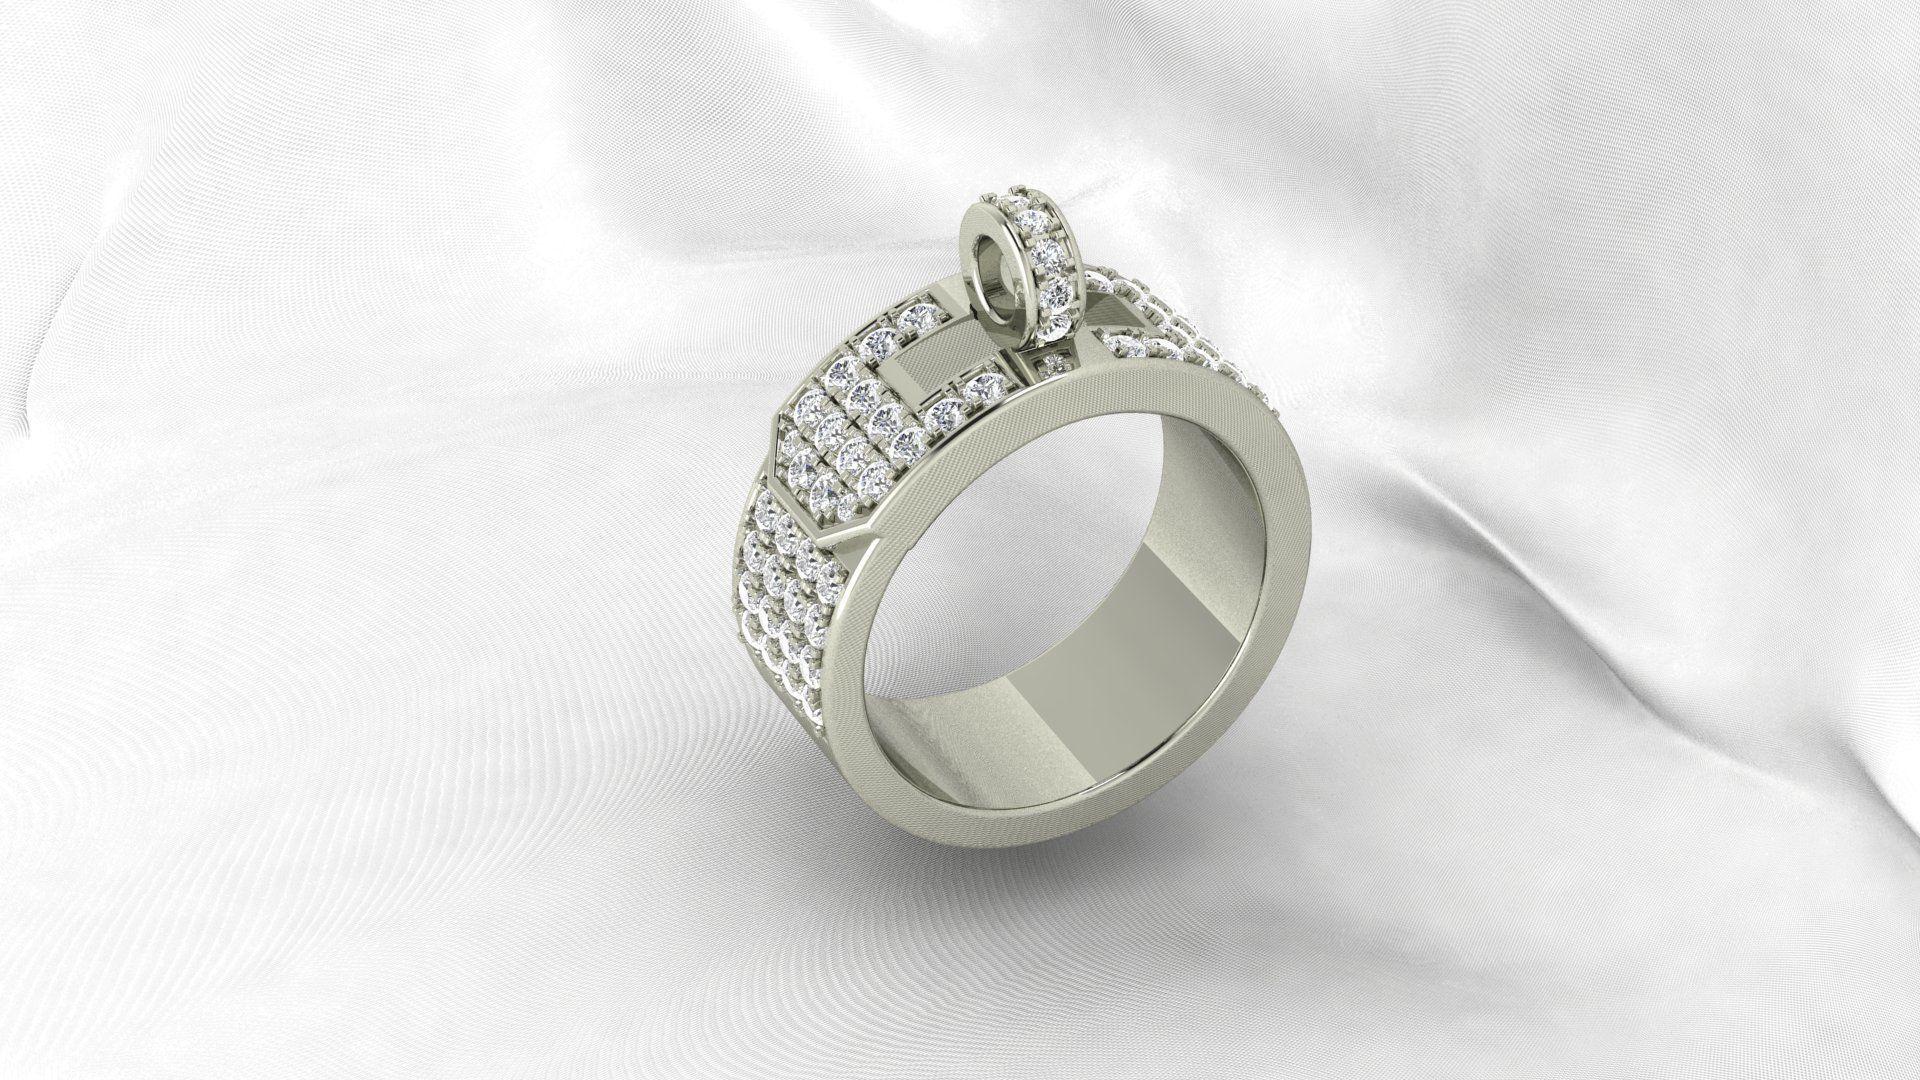 cc2b8f858c24 ... where to buy hermes diamond ring 3d model stl 3dm 2 930ba 9be0e